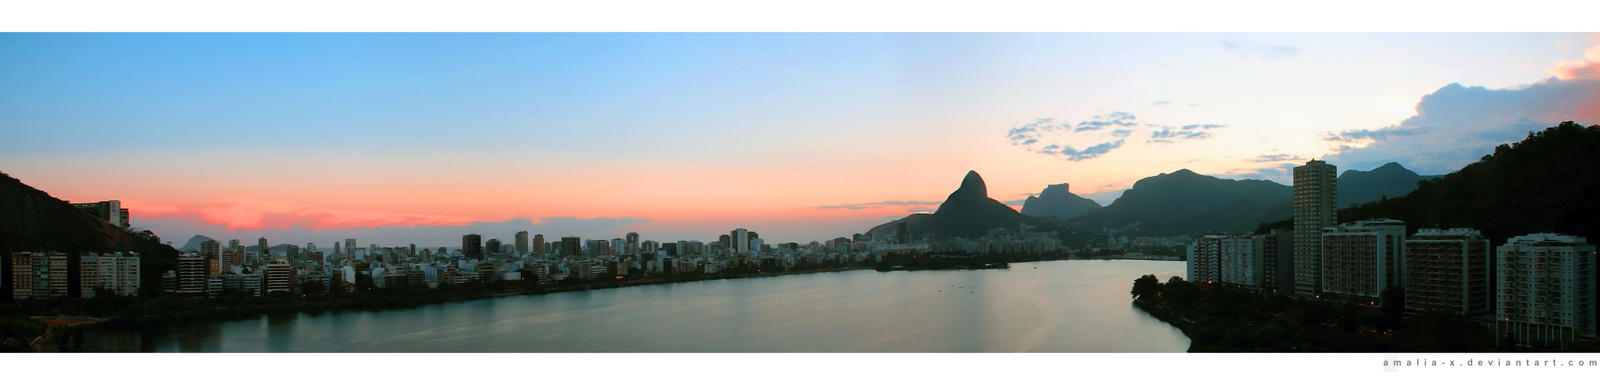 Colours of Rio